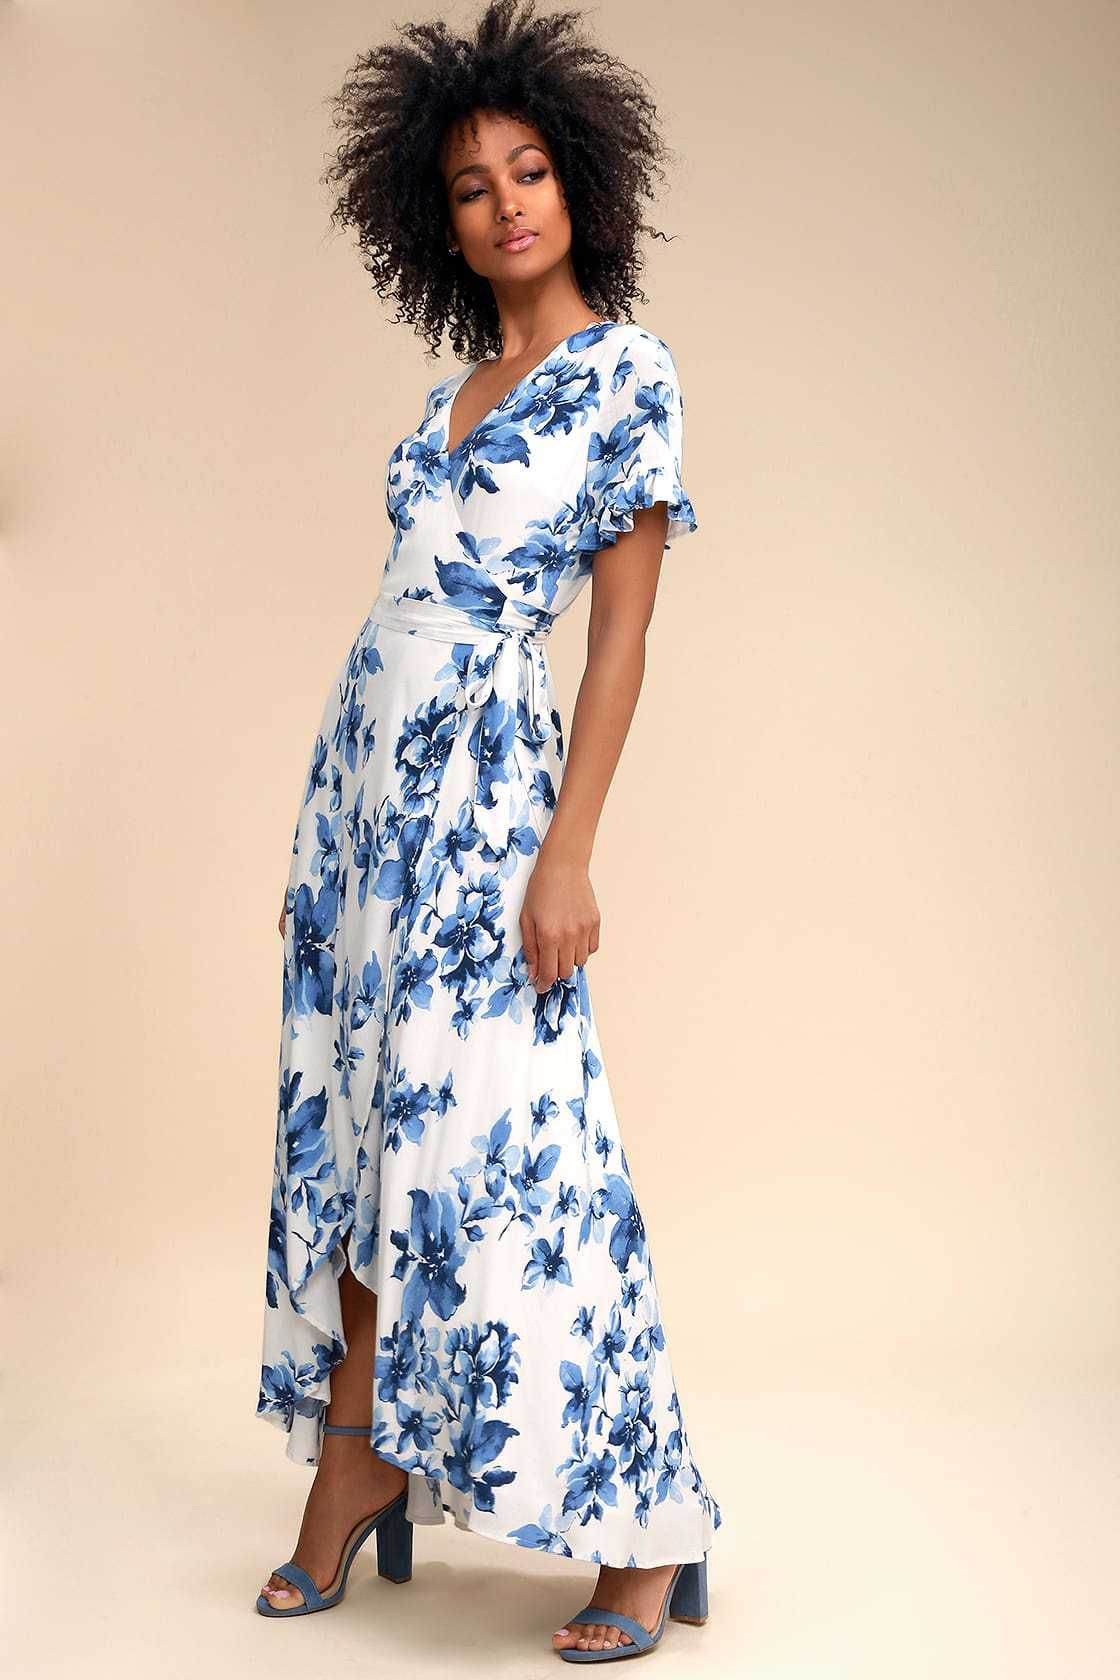 40 Cute Summer Sundresses Under 100 Dani Thompson Chic Capsule Closet Floral Blue Dress Dresses Floral Print Midi Dress [ 1680 x 1120 Pixel ]